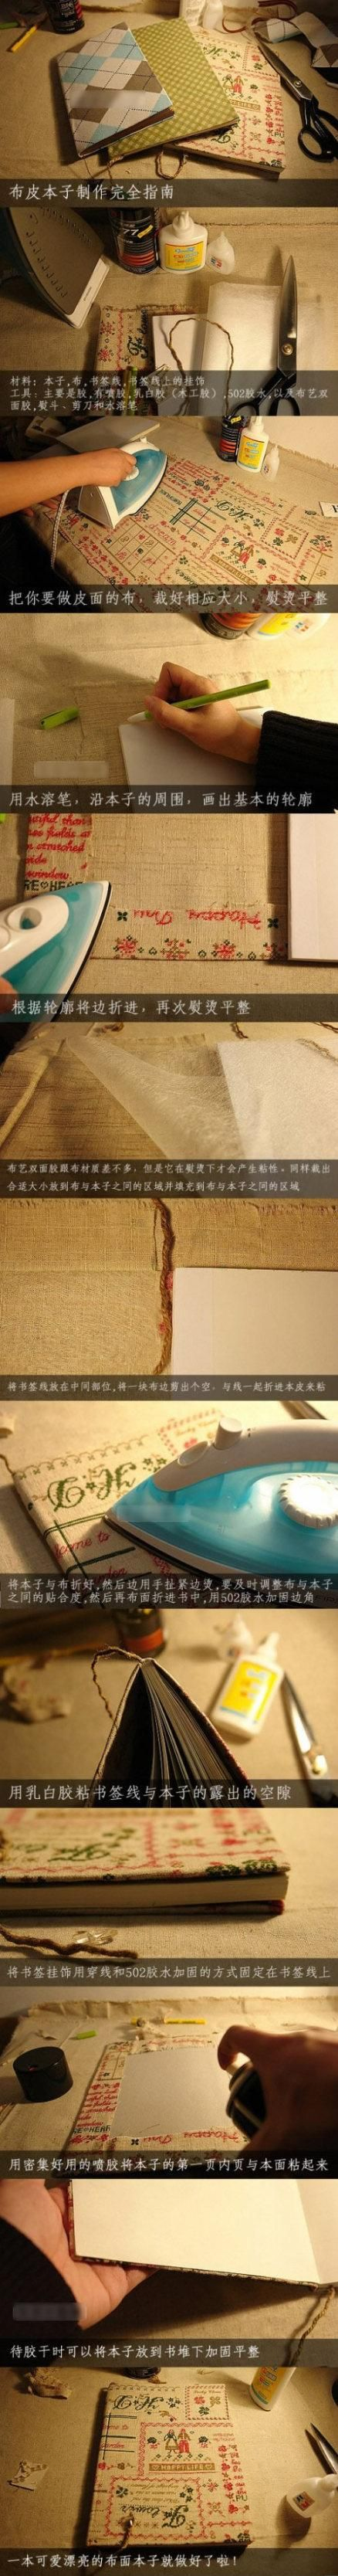 entelar la tapa de un libro o cuaderno. (¿con entretela adhesiva?)